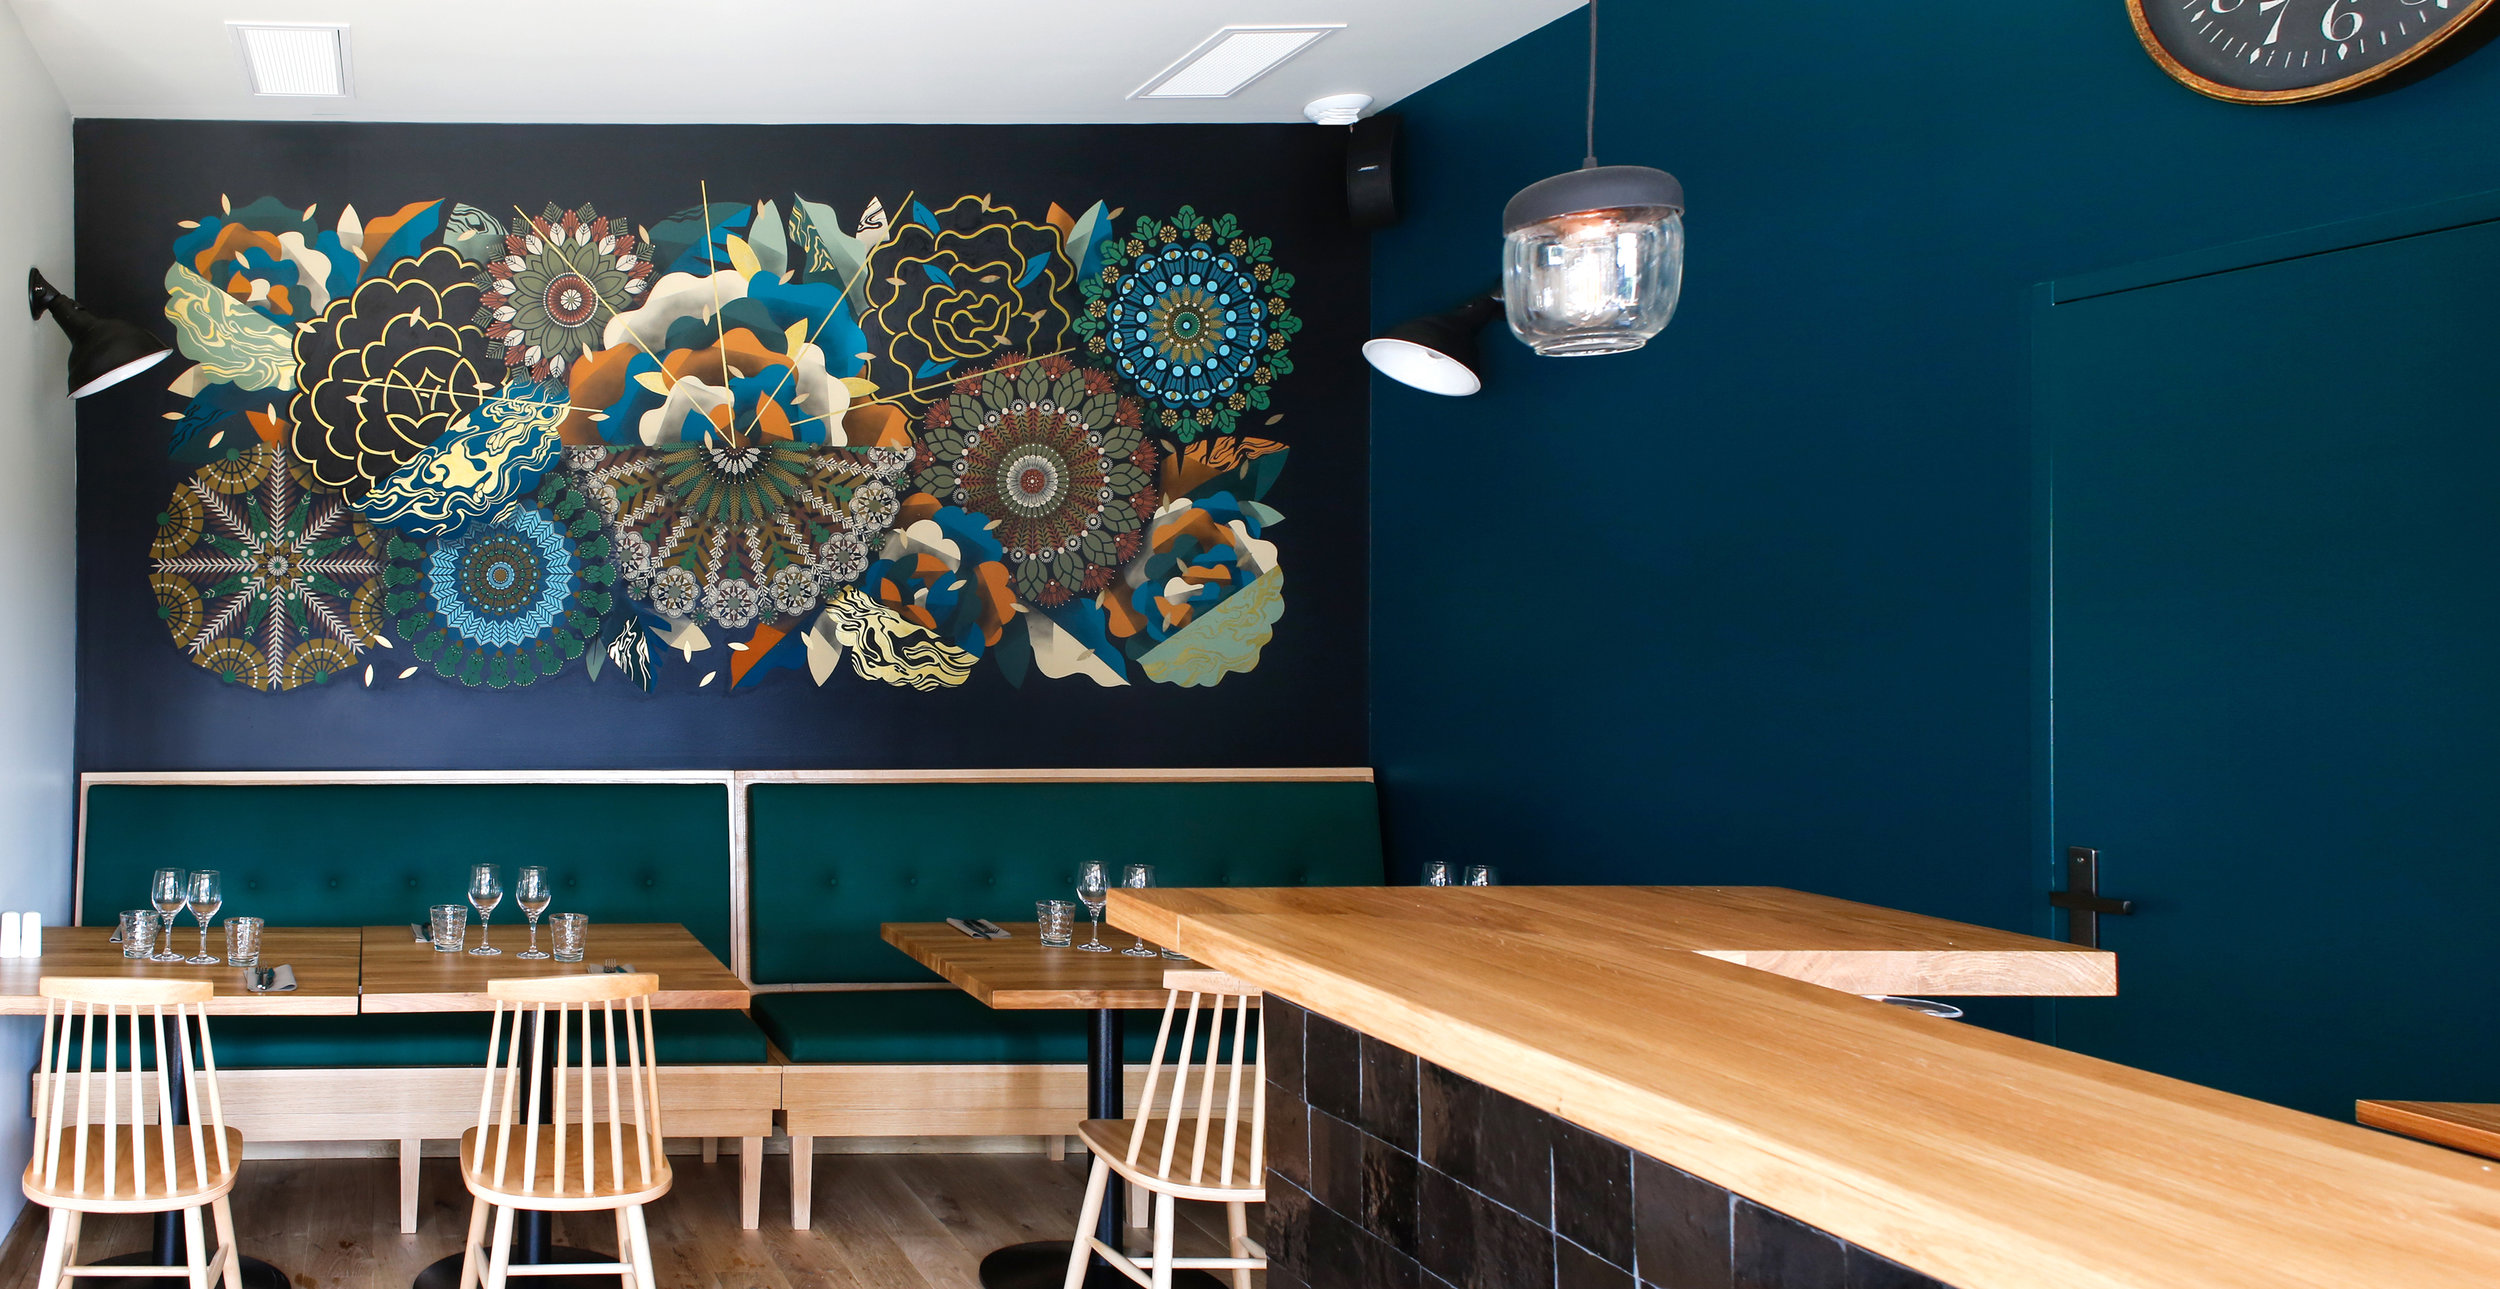 Mur Végétal #6  - Arroma restaurant, Montalivet - FR | 2018 w/ SupaKitch